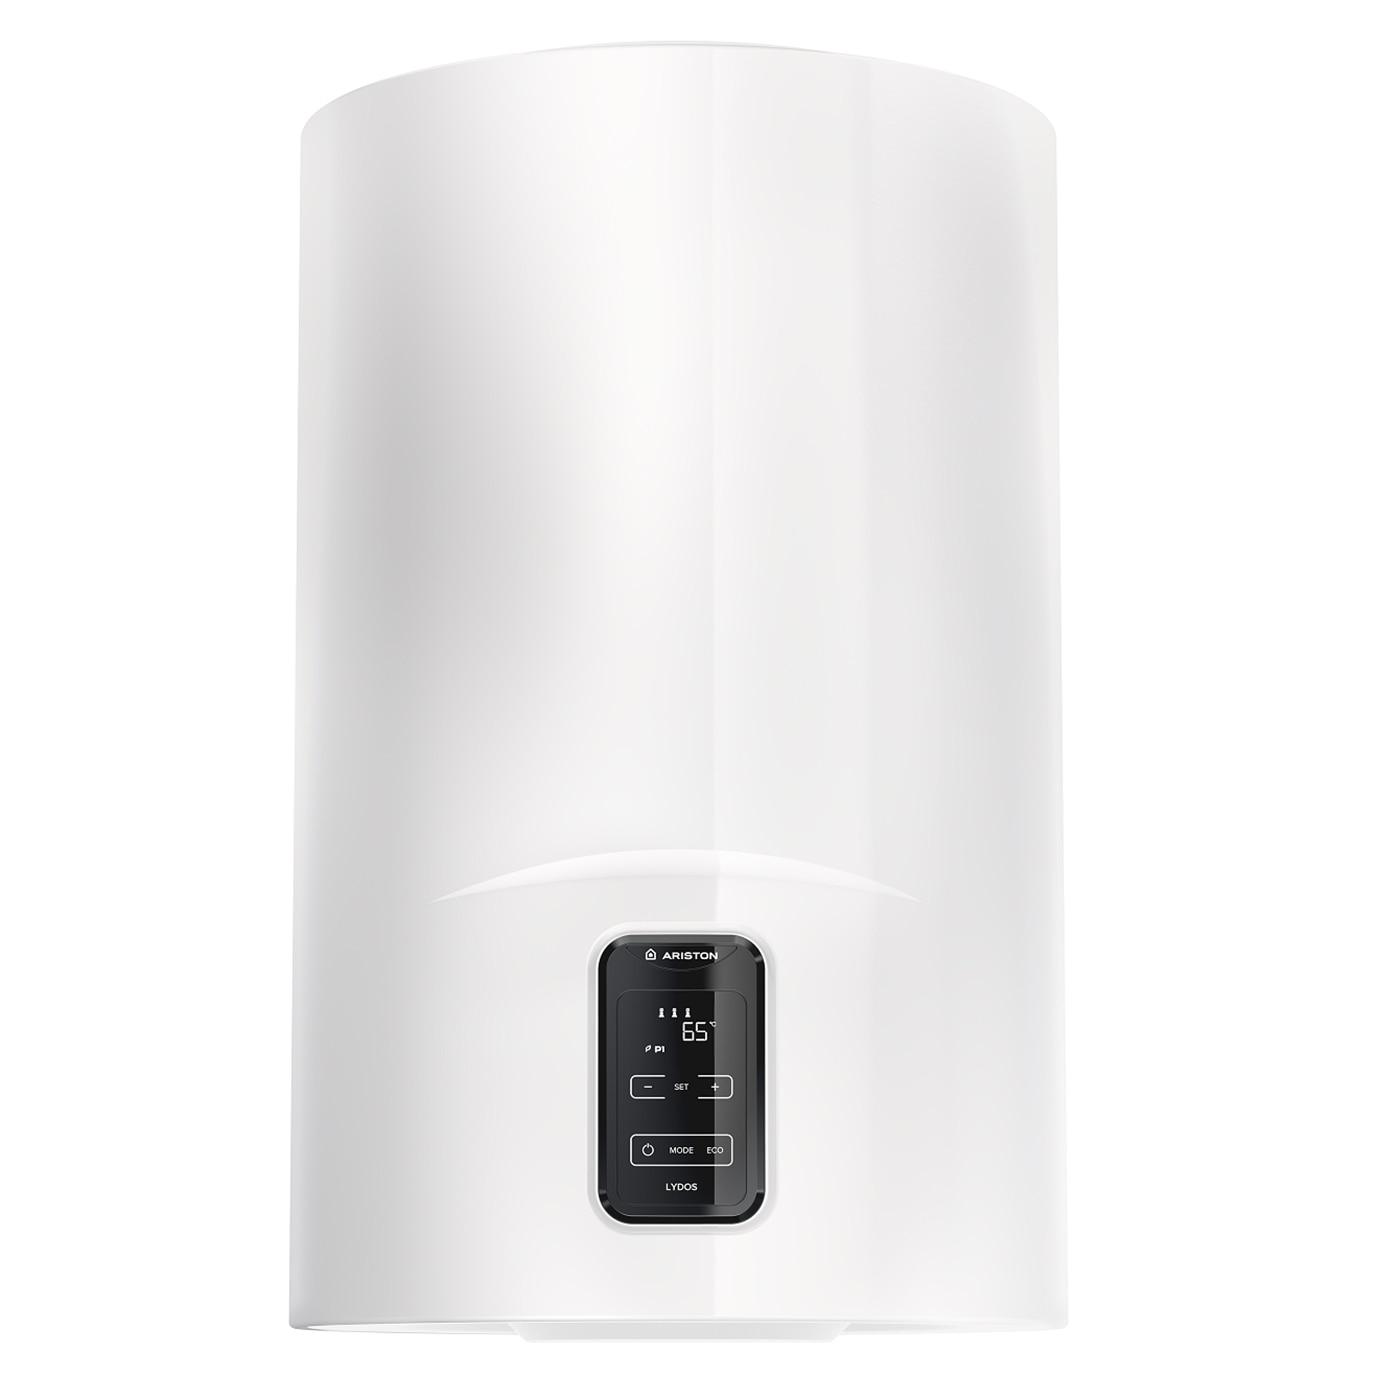 Fotografie Boiler electric Ariston Lydos Plus 100L, 1800 W, programare saptamanala, rezervor emailat cu Titan